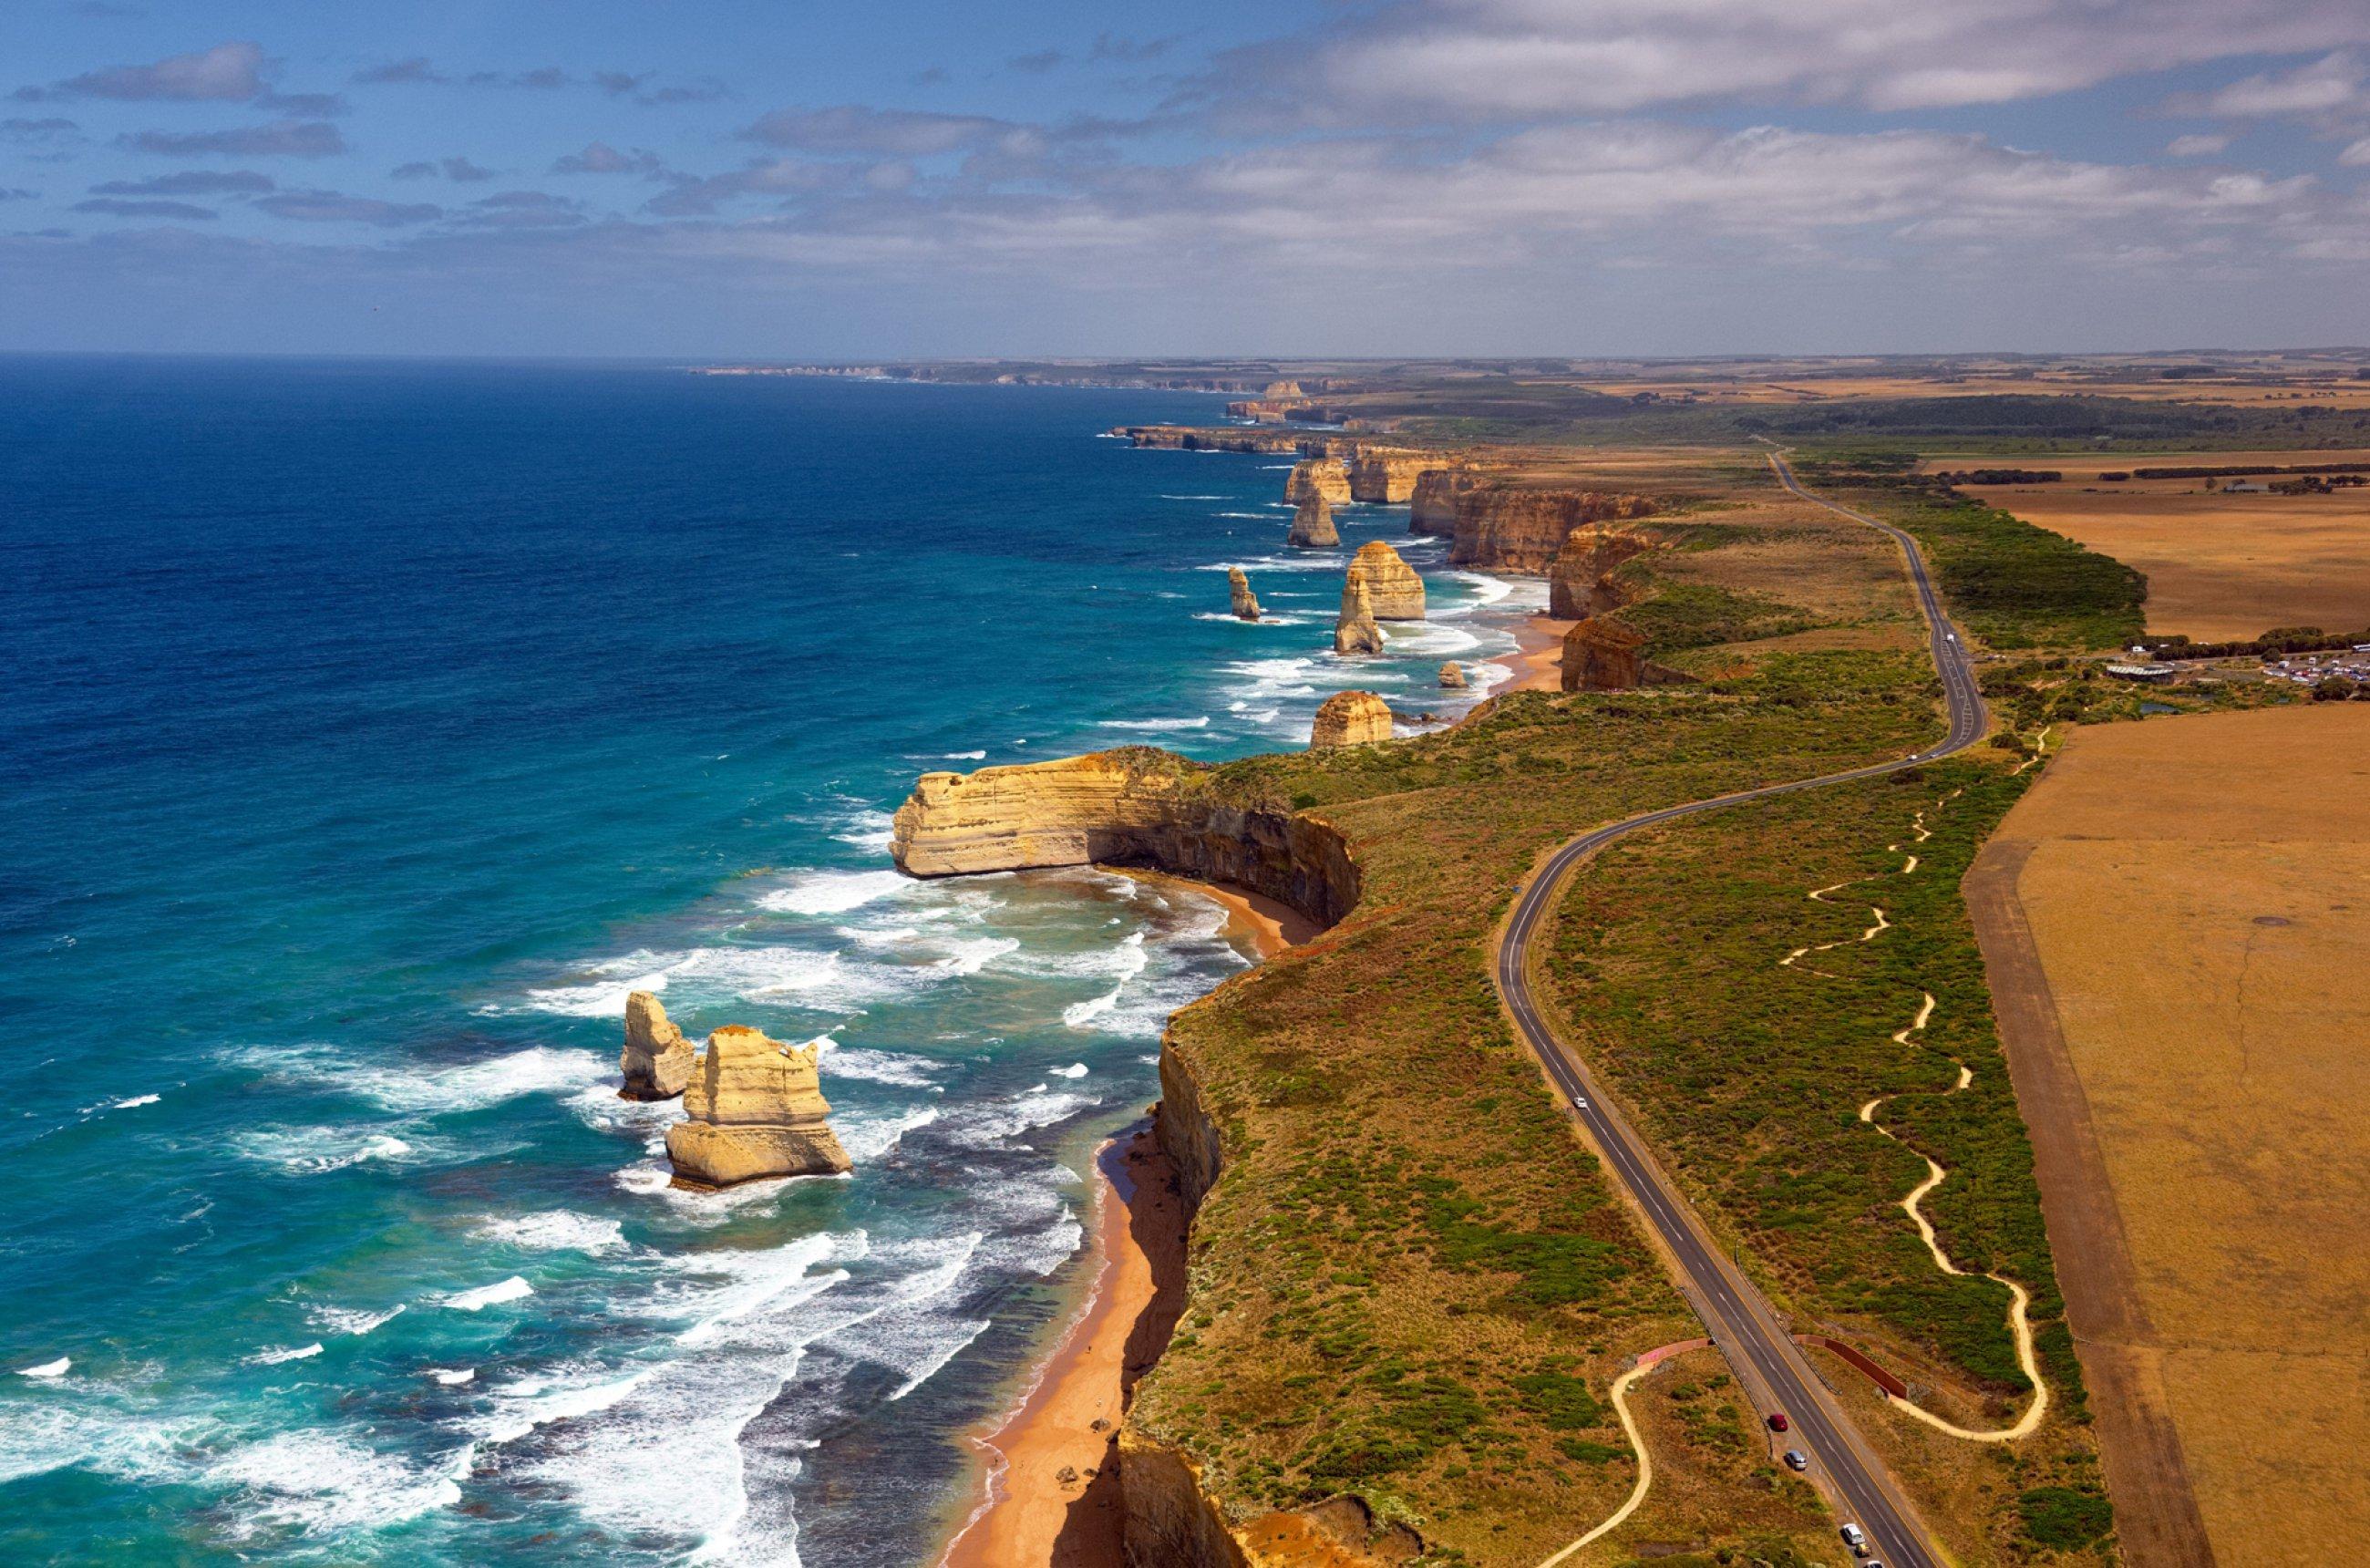 https://bubo.sk/uploads/galleries/5031/great-ocean-road-shutterstock-273439982-1-.jpg